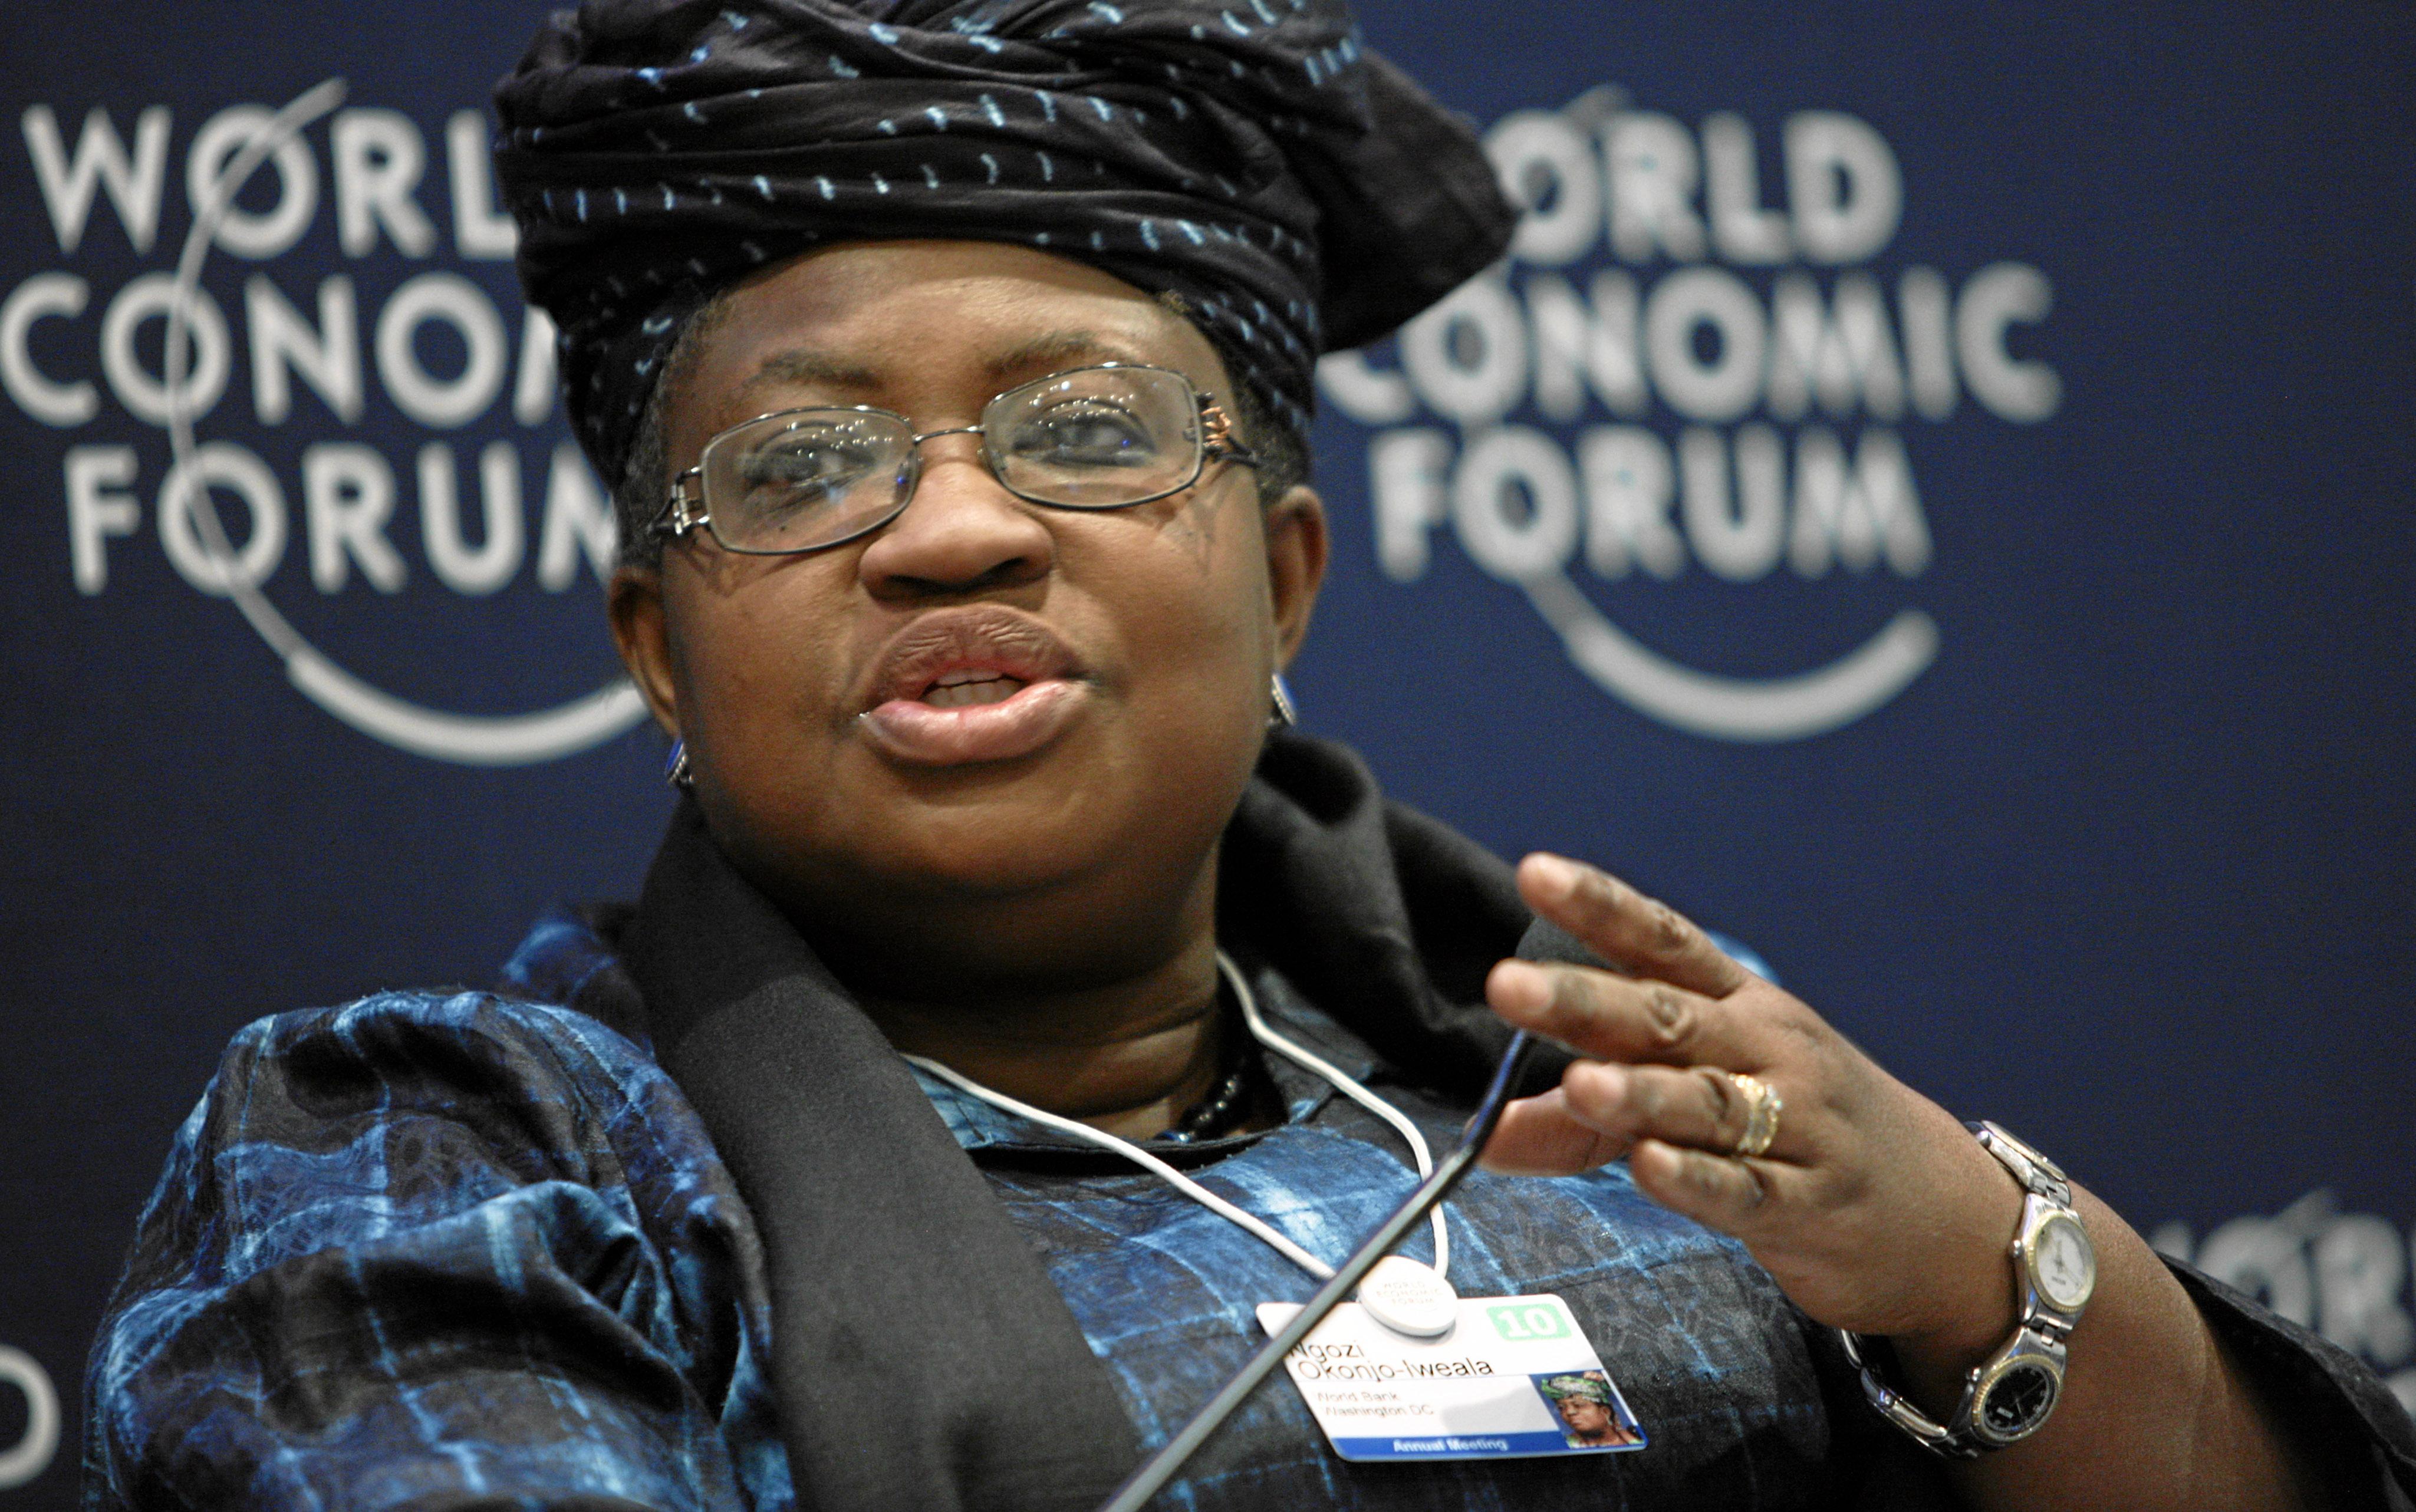 Watch Live: Ngozi Okonjo-Iweala and Bono at Davos